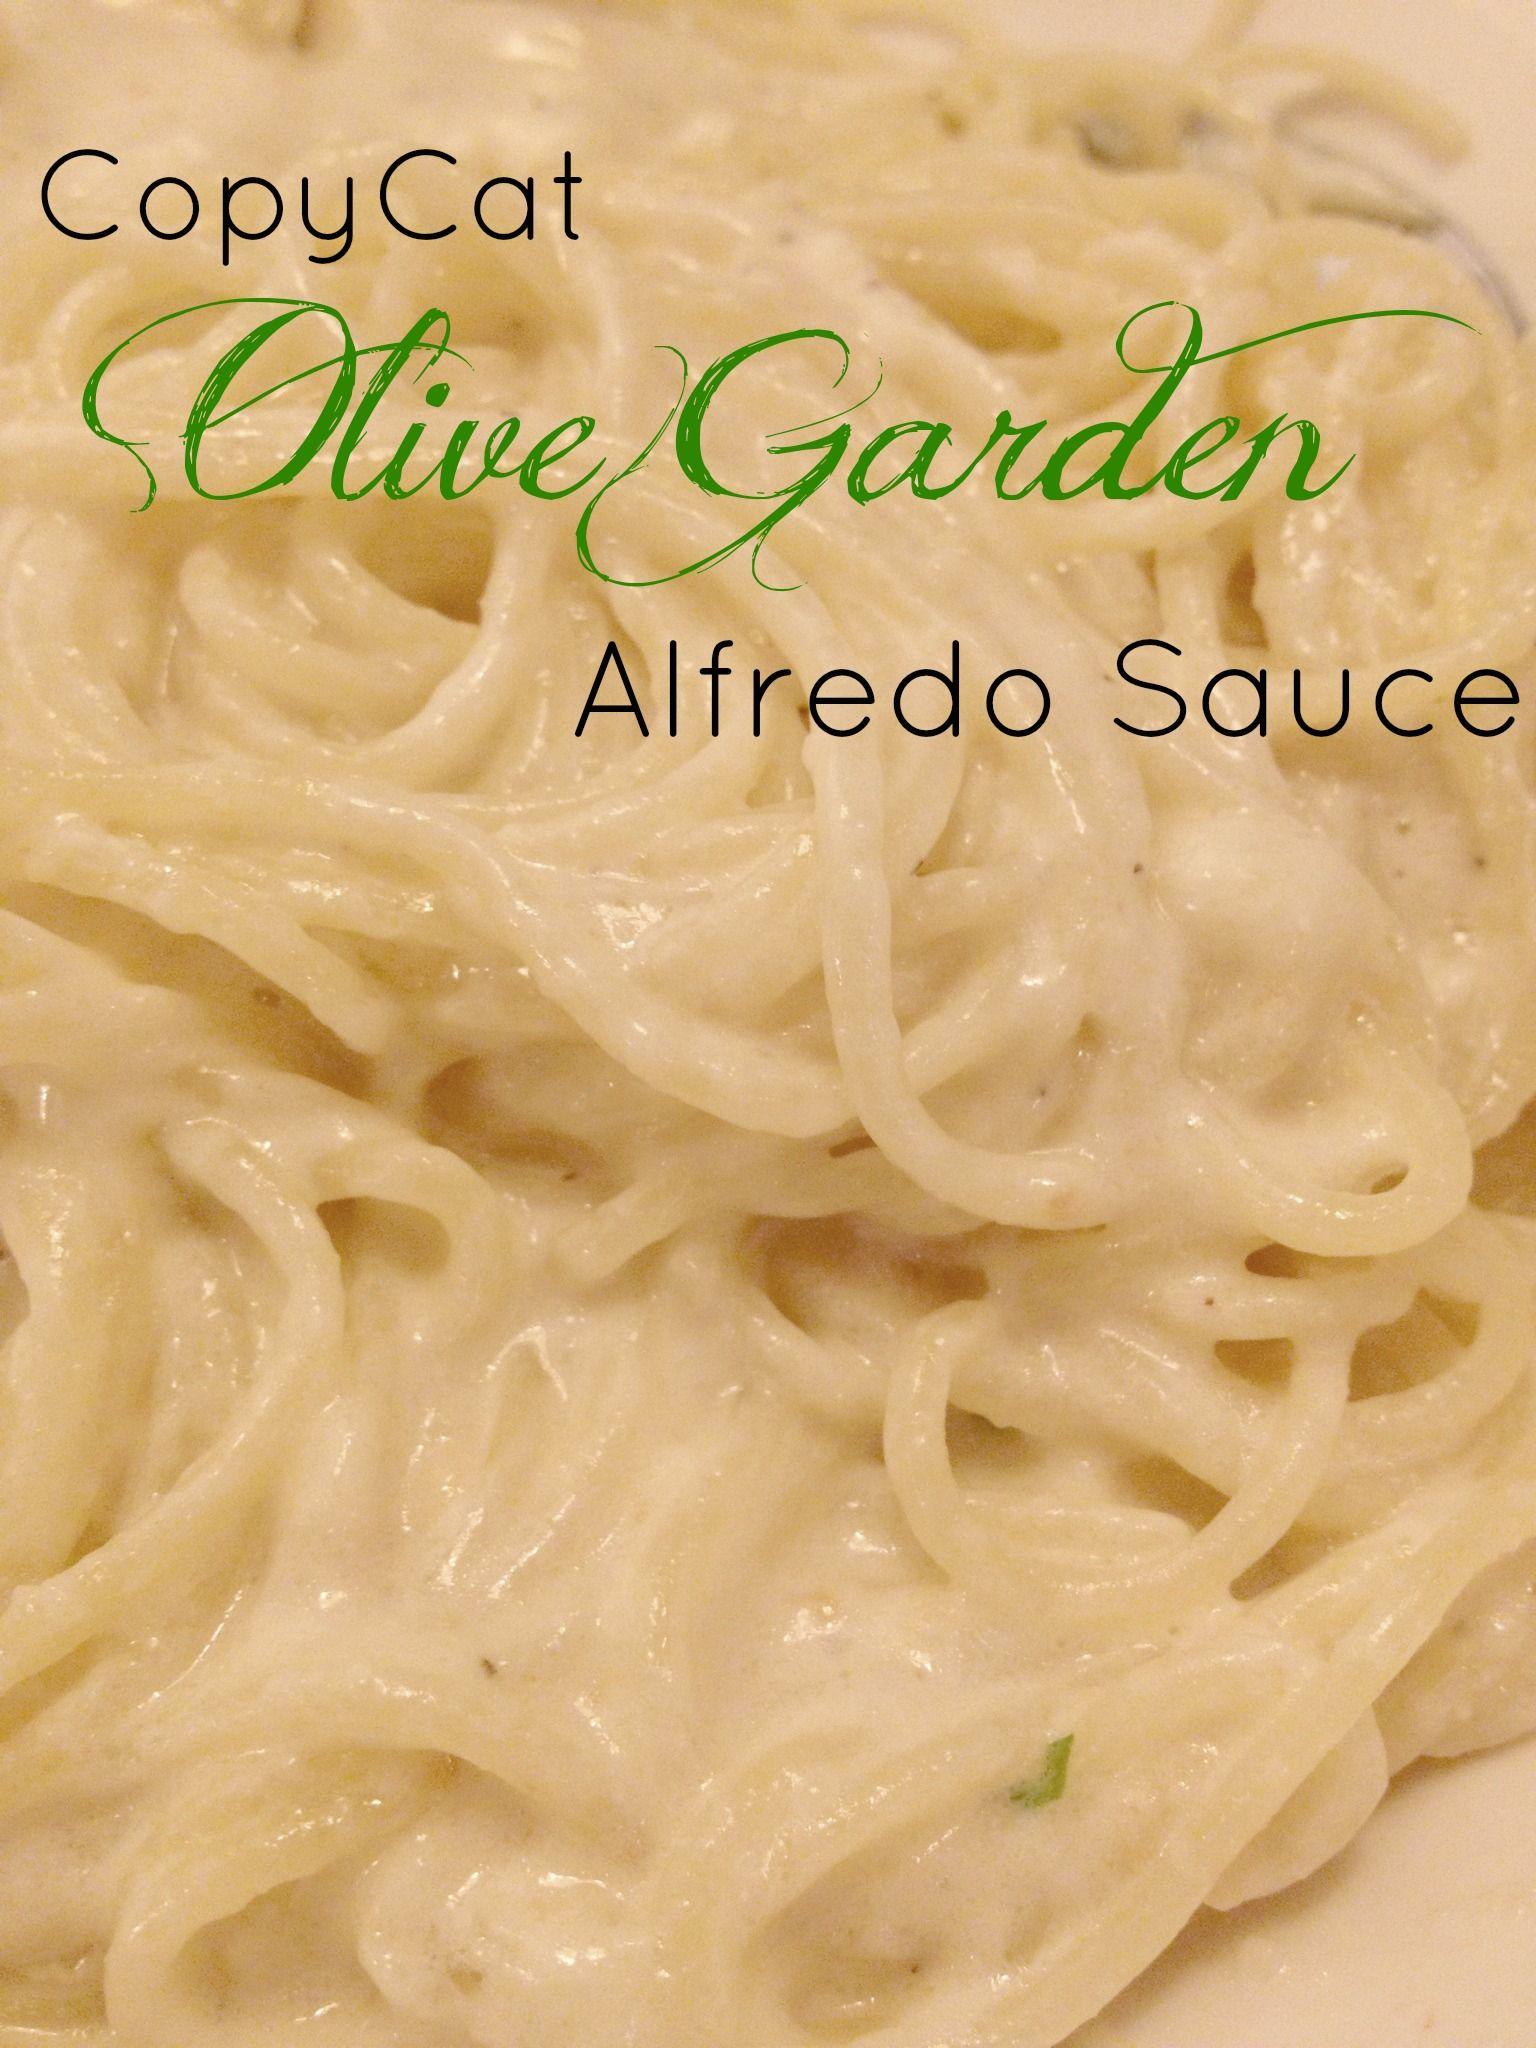 Copycat Copycat Olive Garden Alfredo Sauce an at home